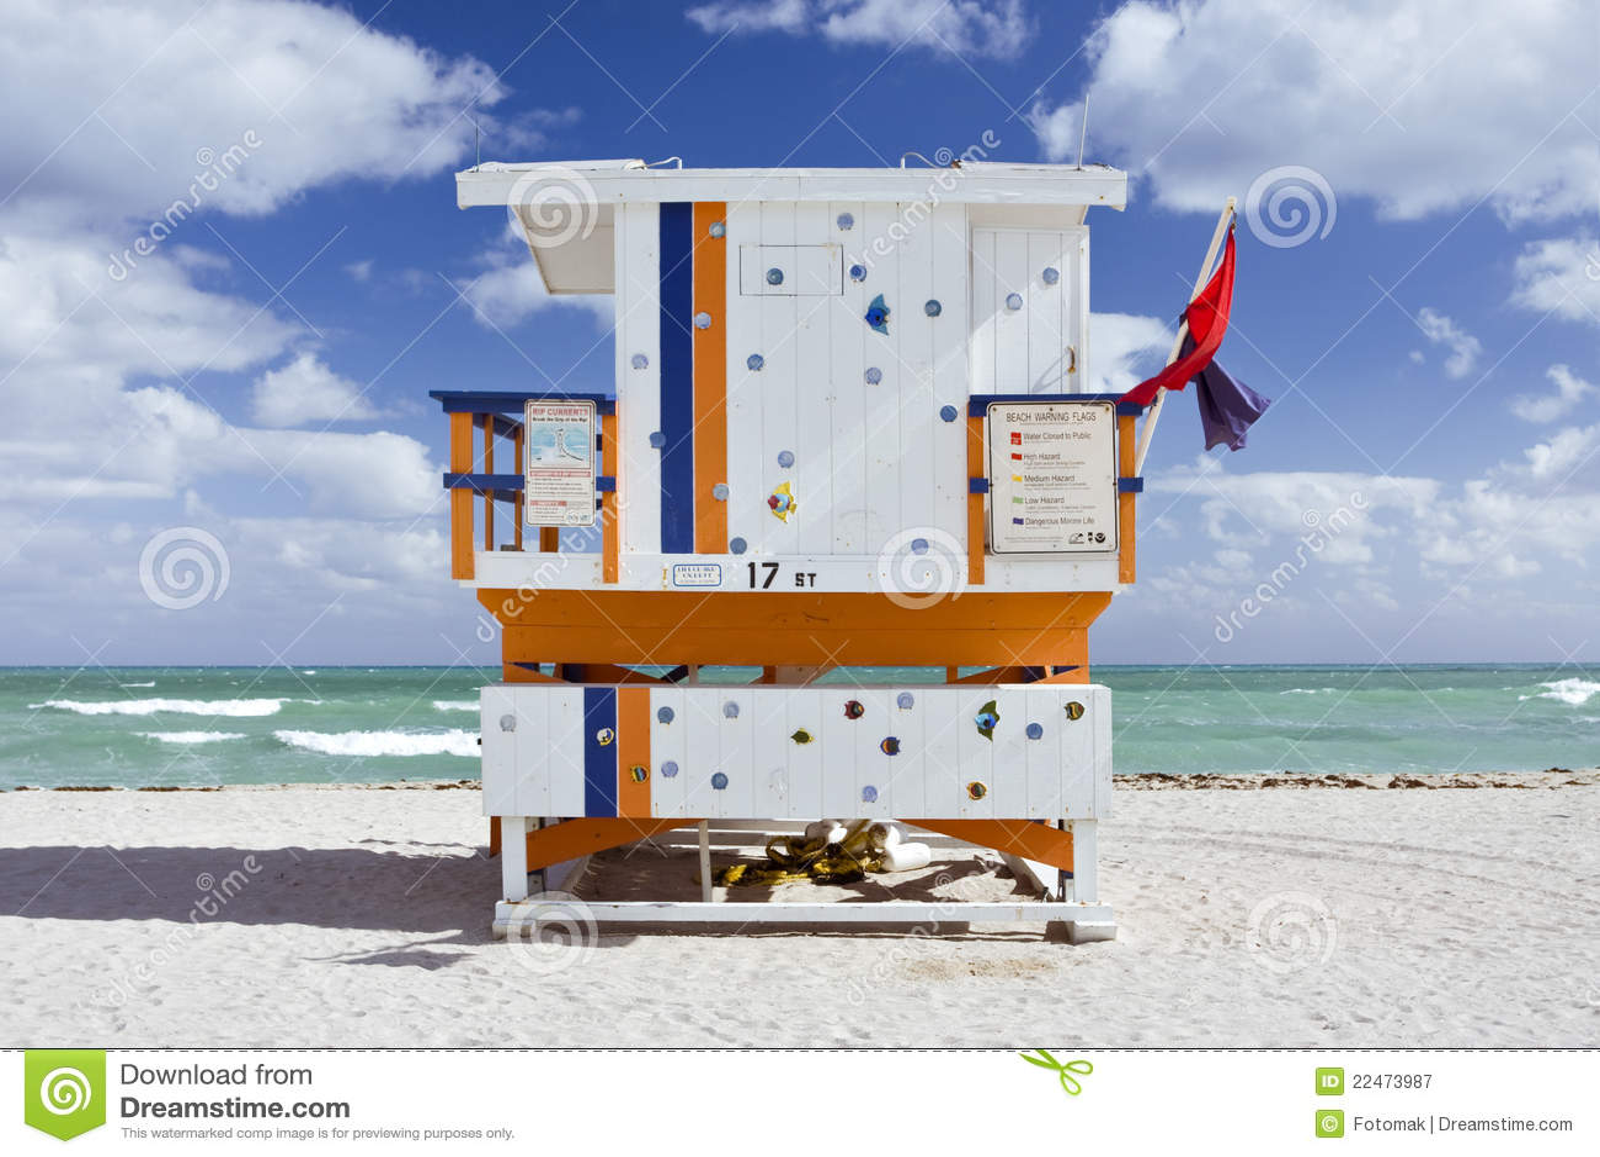 Miami beach dating scene